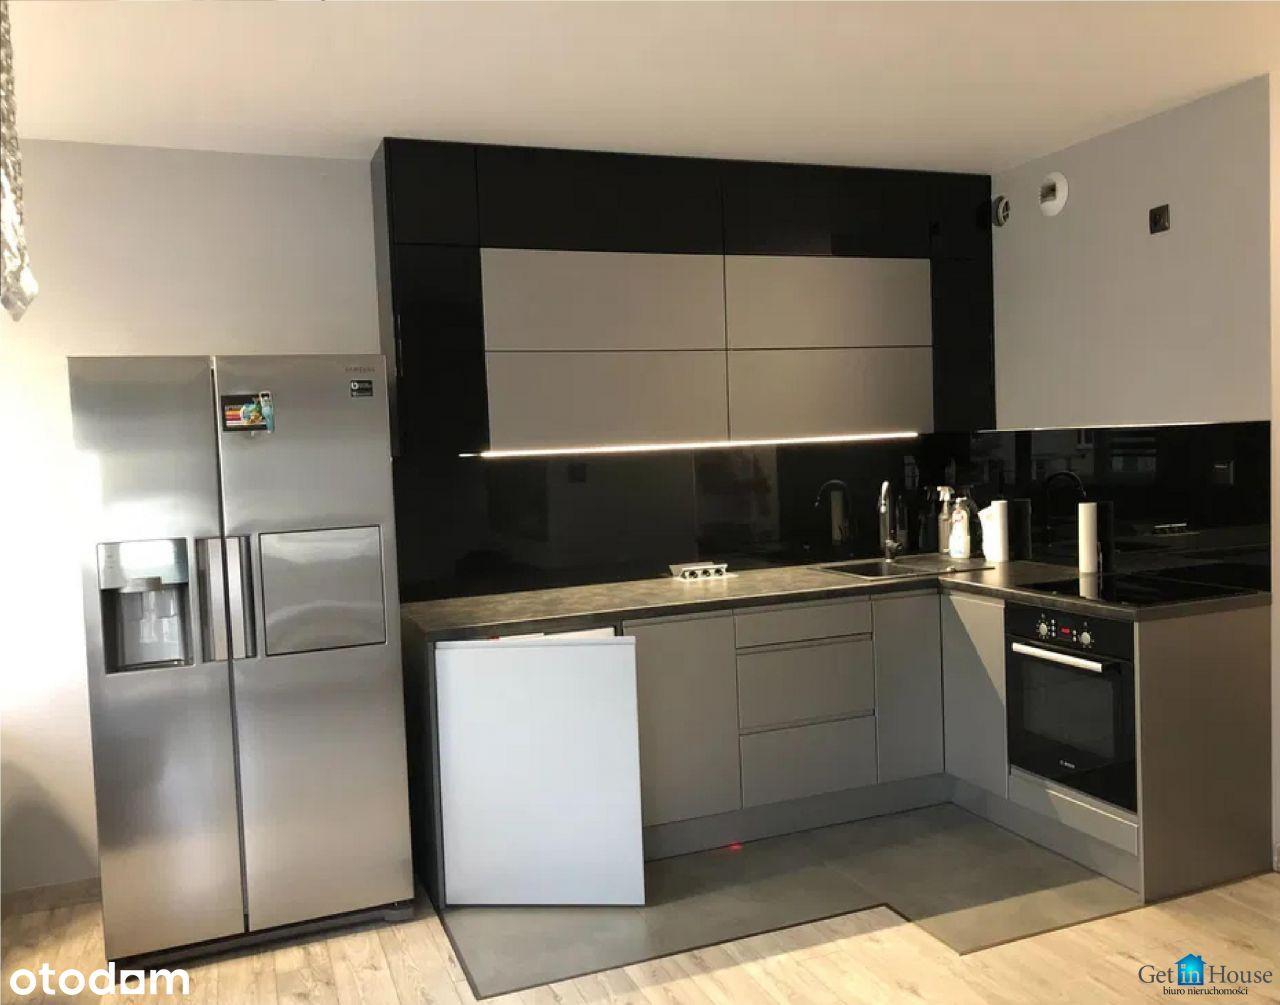 Mieszkanie w apartamencie - Centrum Kielc